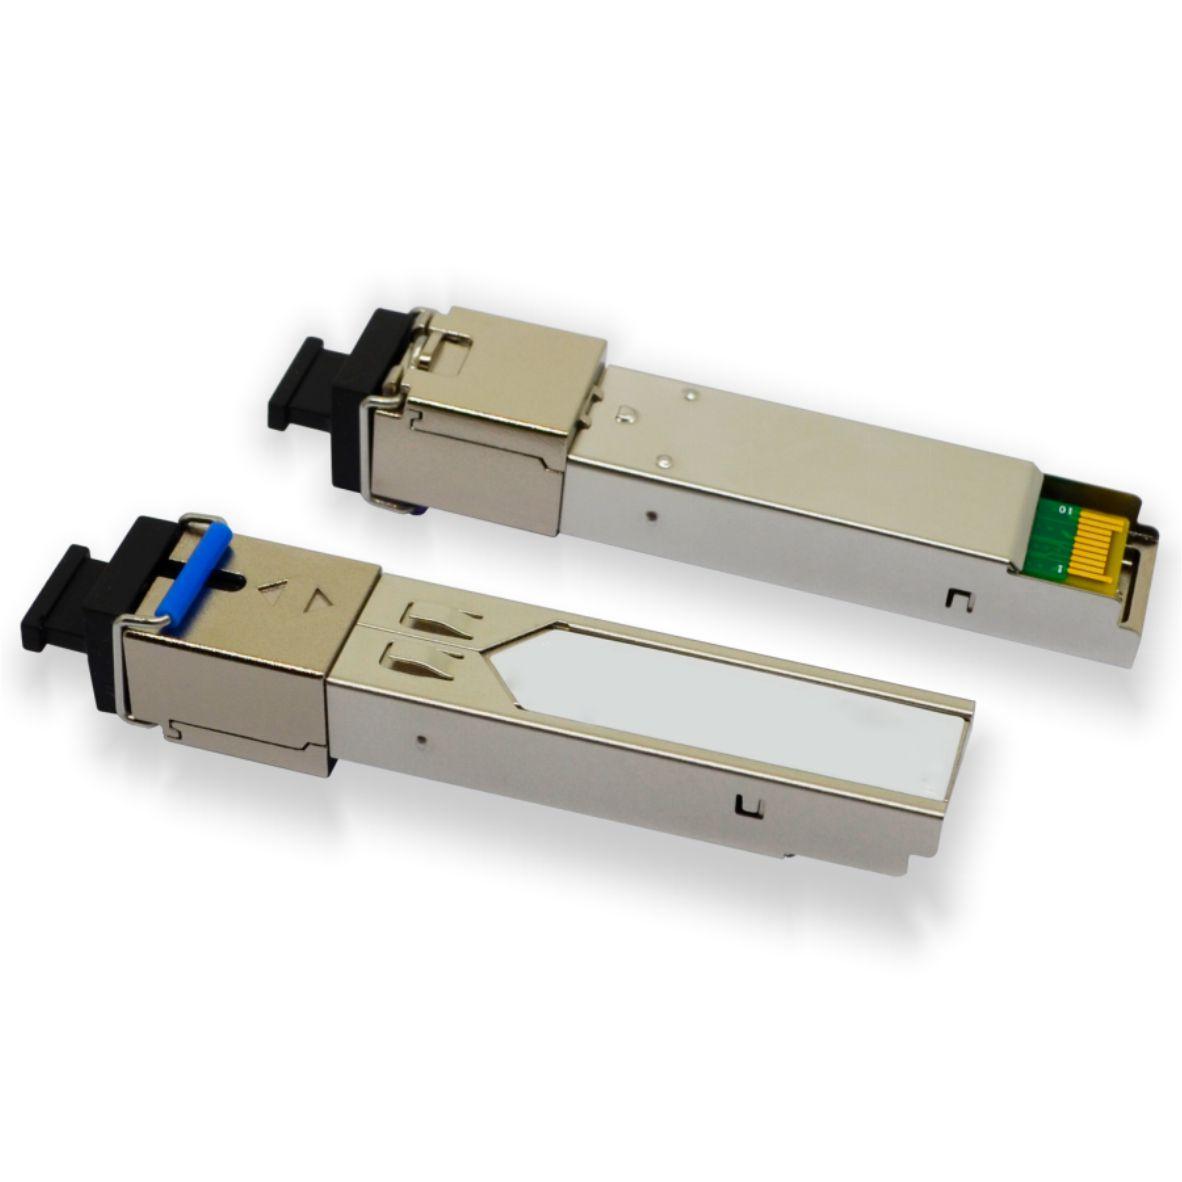 Módulo Óptico SFP (Mini GBIC) – Gigabit Ethernet – Multímodo – Simplex SC – 2Km (1310-1550) – FMP35-1MM2C-SC